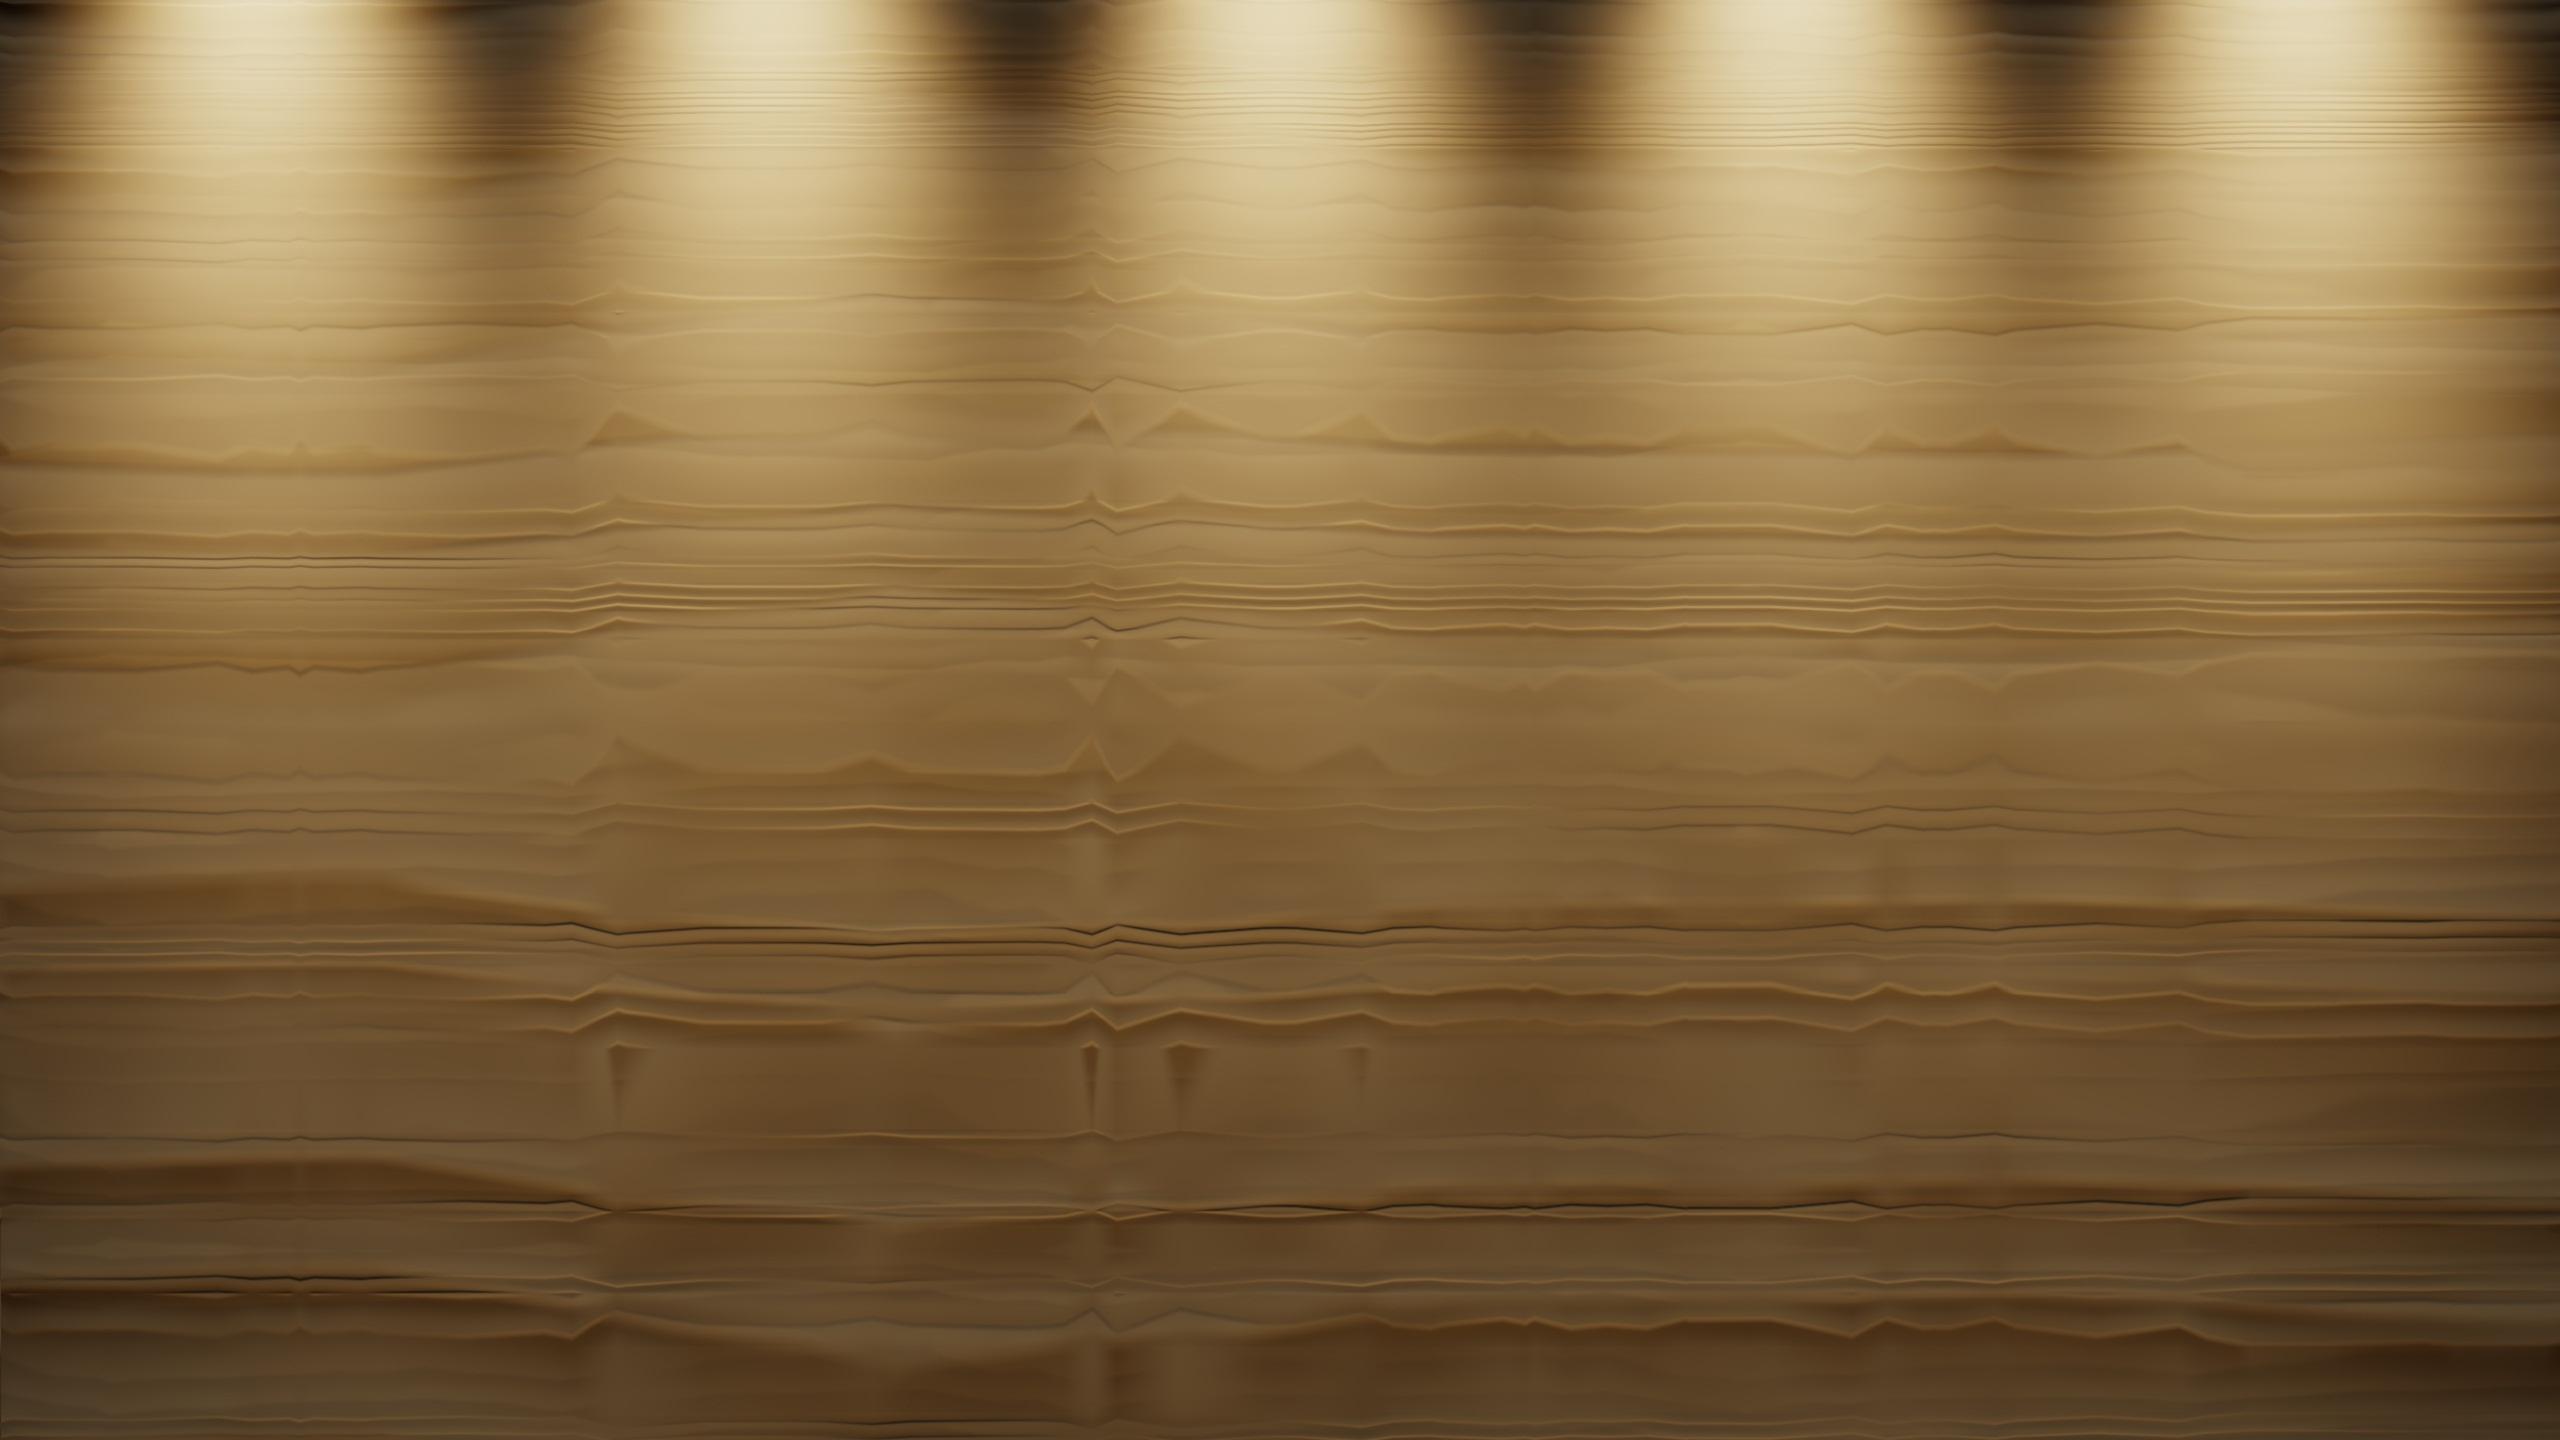 Surface Wood Light Texture